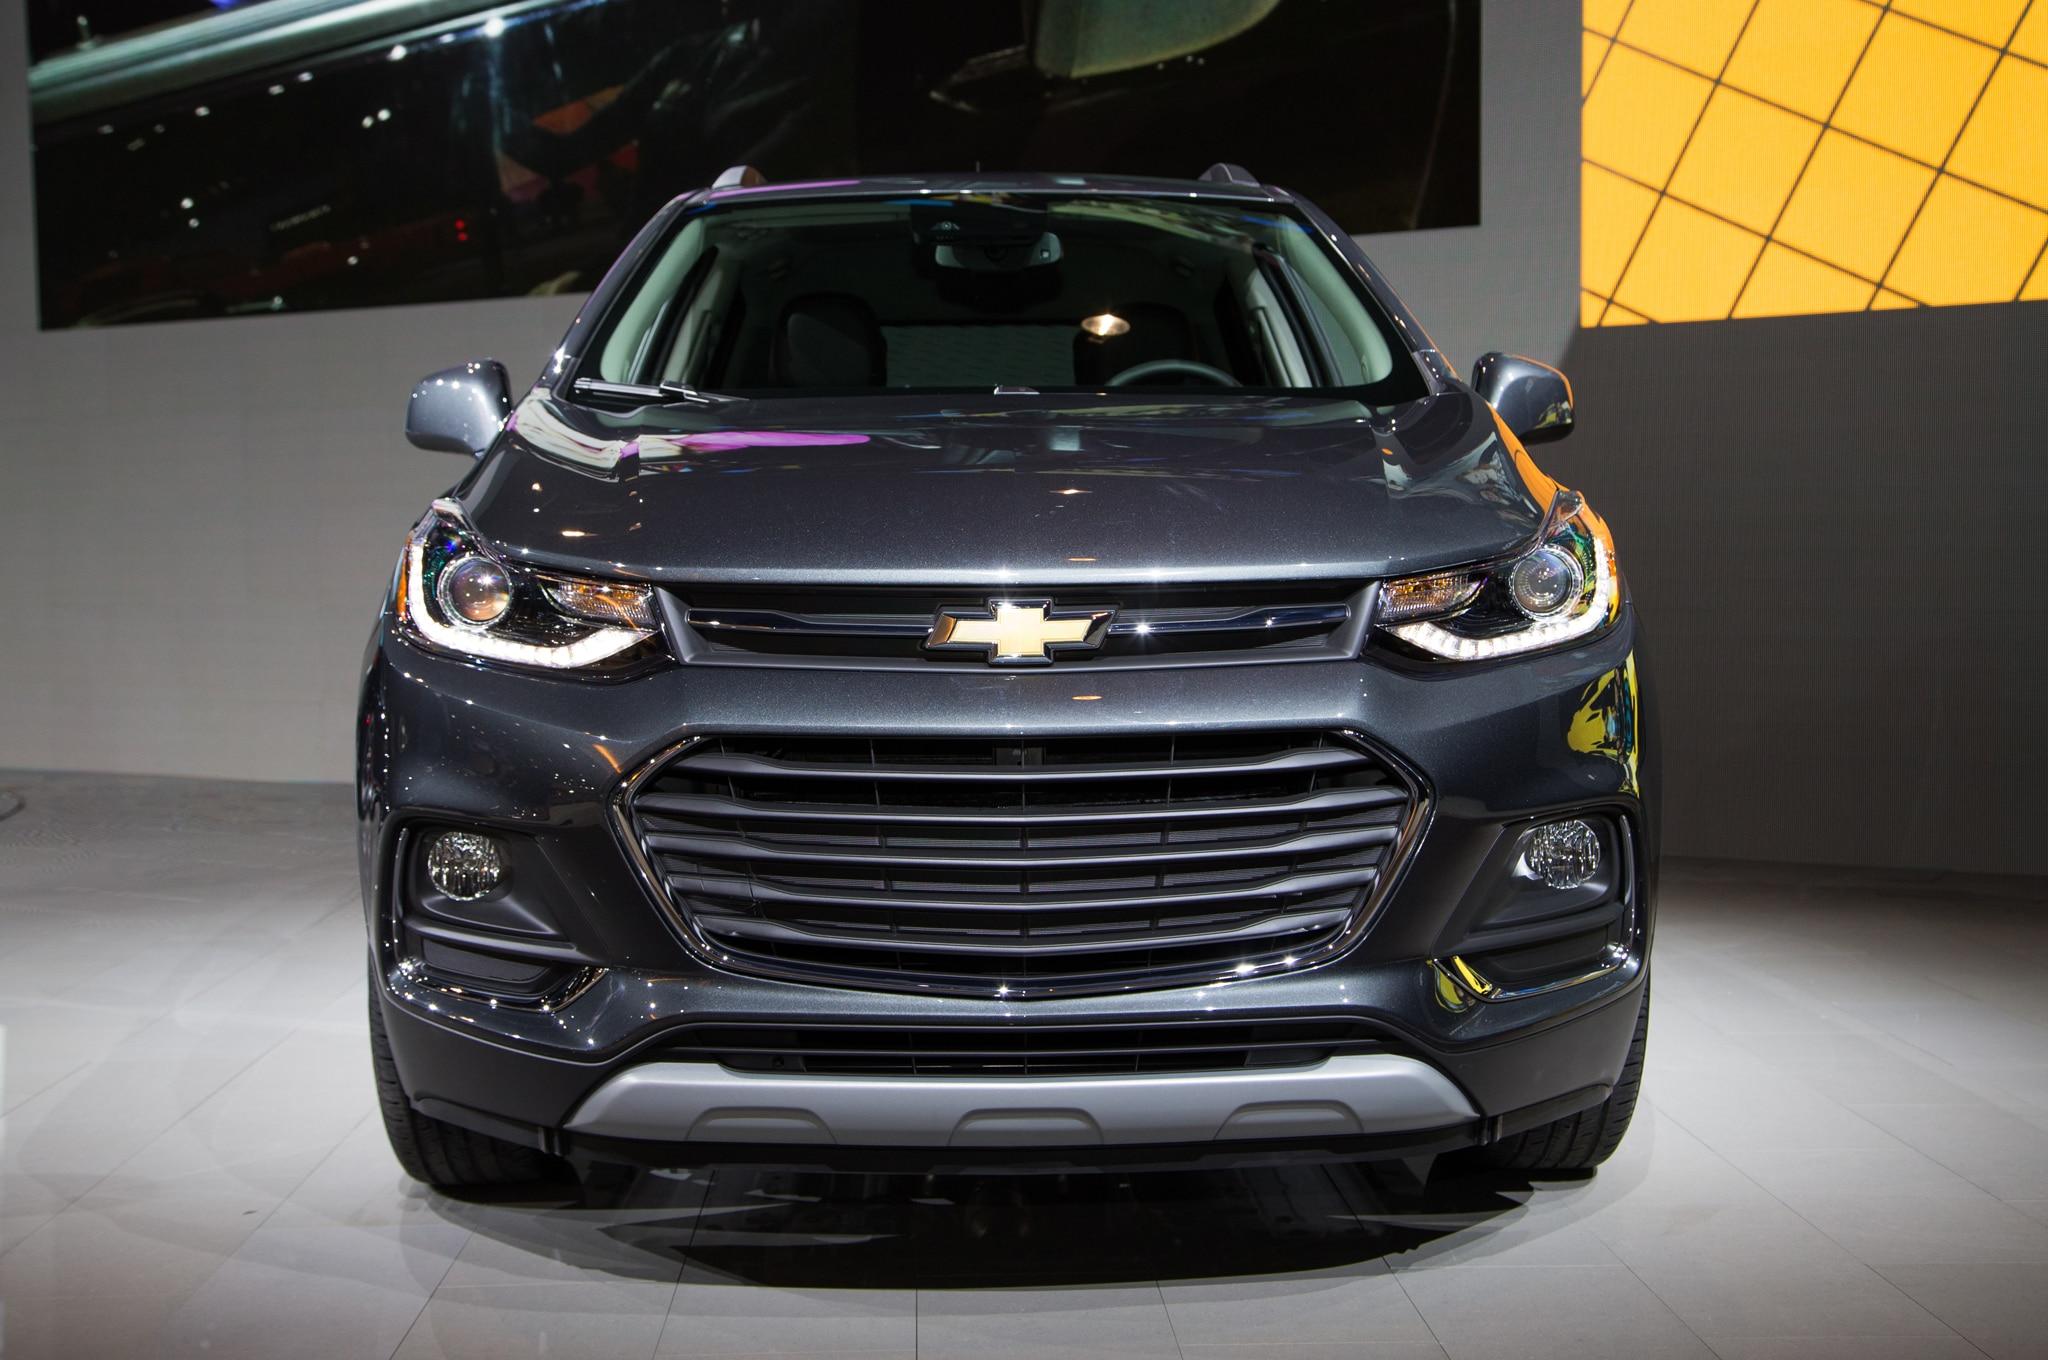 First Drive: 2017 Chevrolet Trax | Automobile Magazine